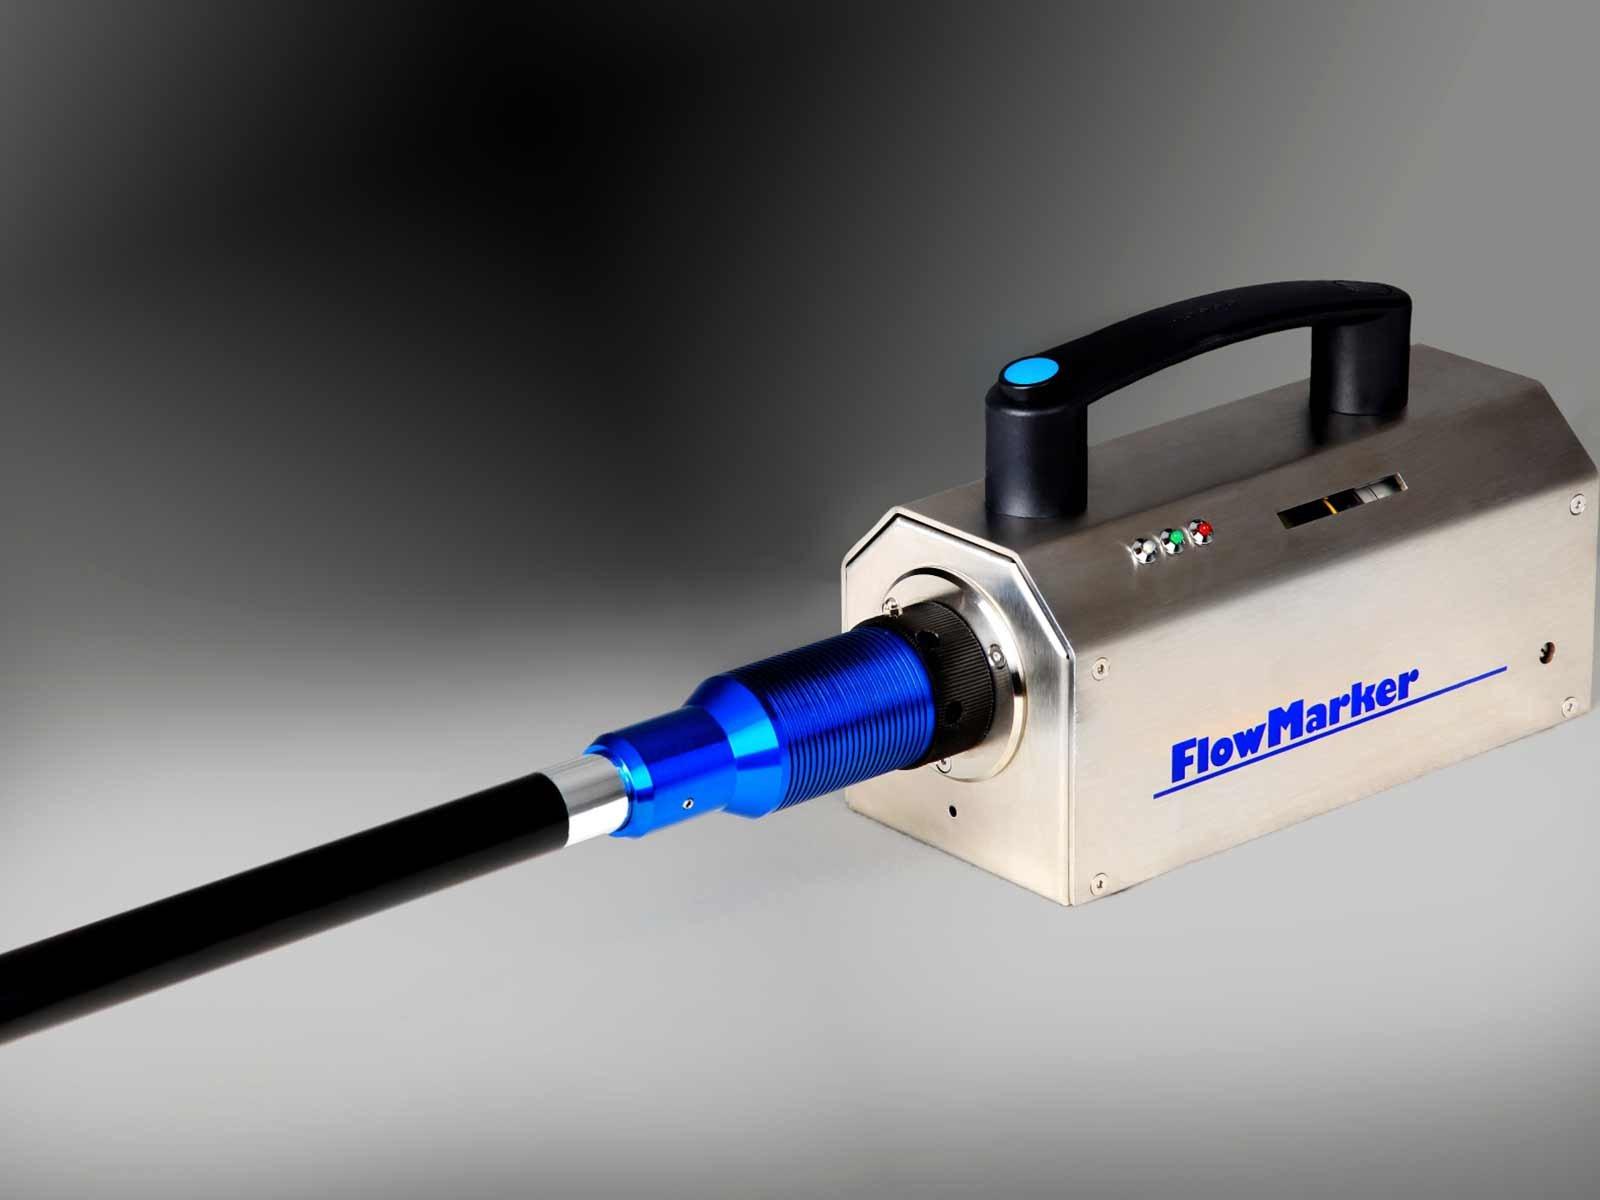 FlowMarker Product